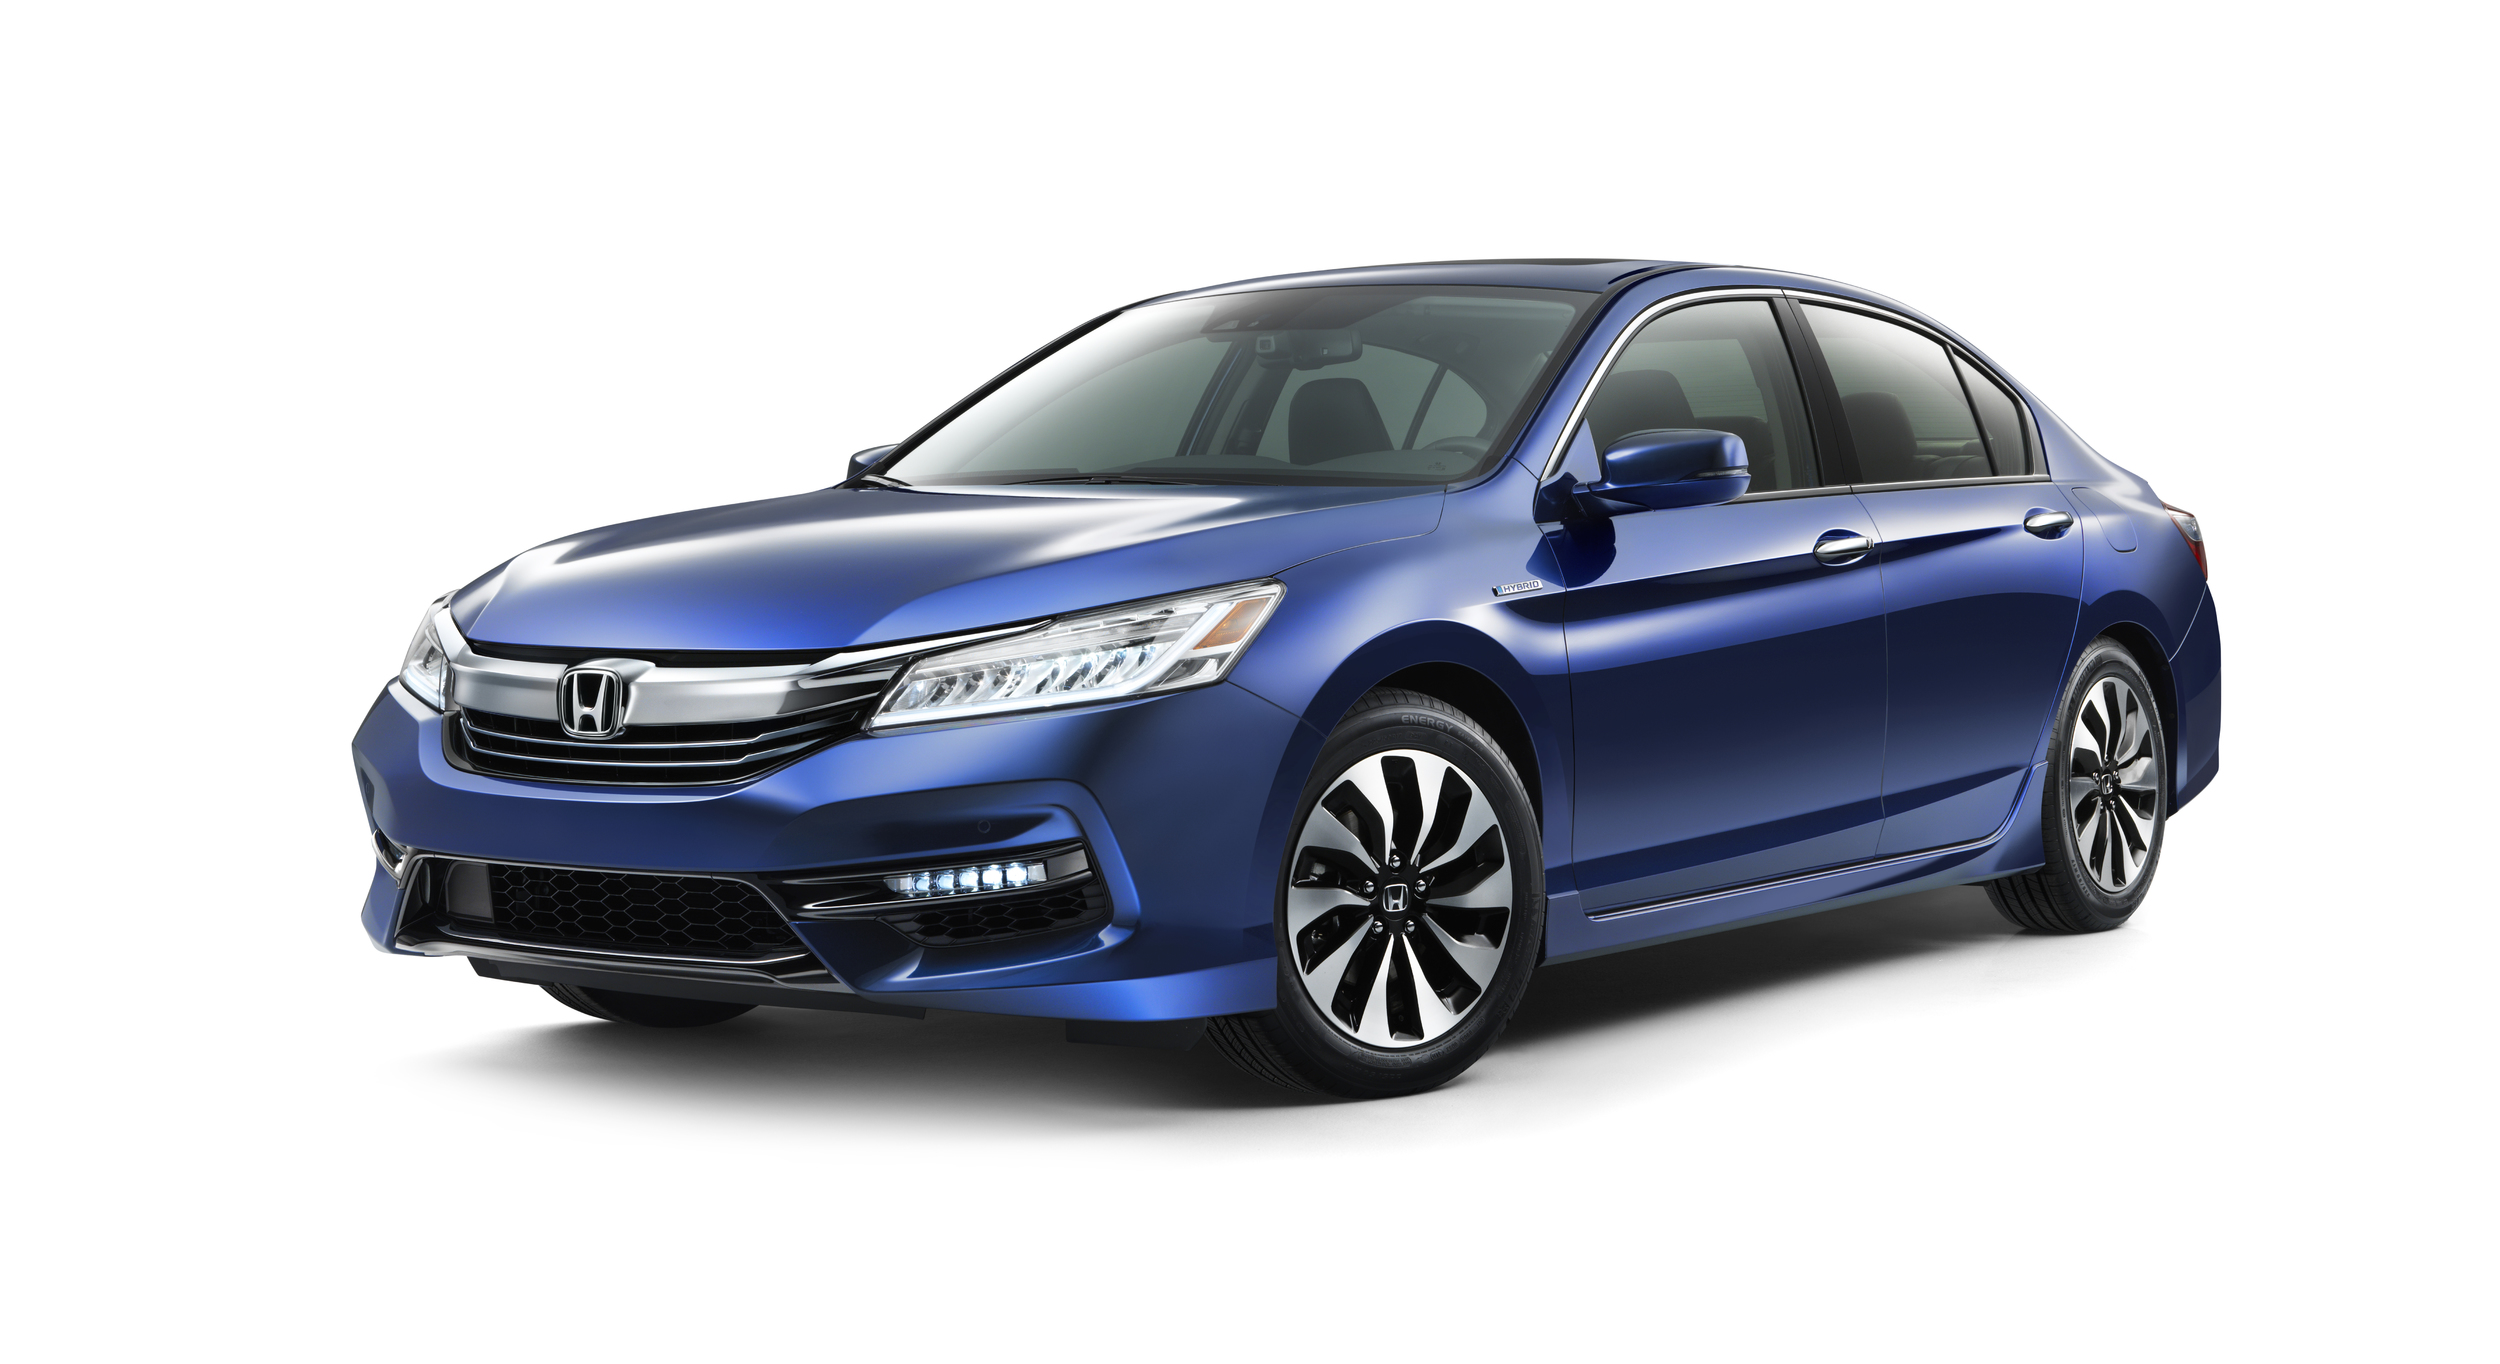 2017 Honda Accord Hybrid Tops Segment with 49 MPG City - autoevolution